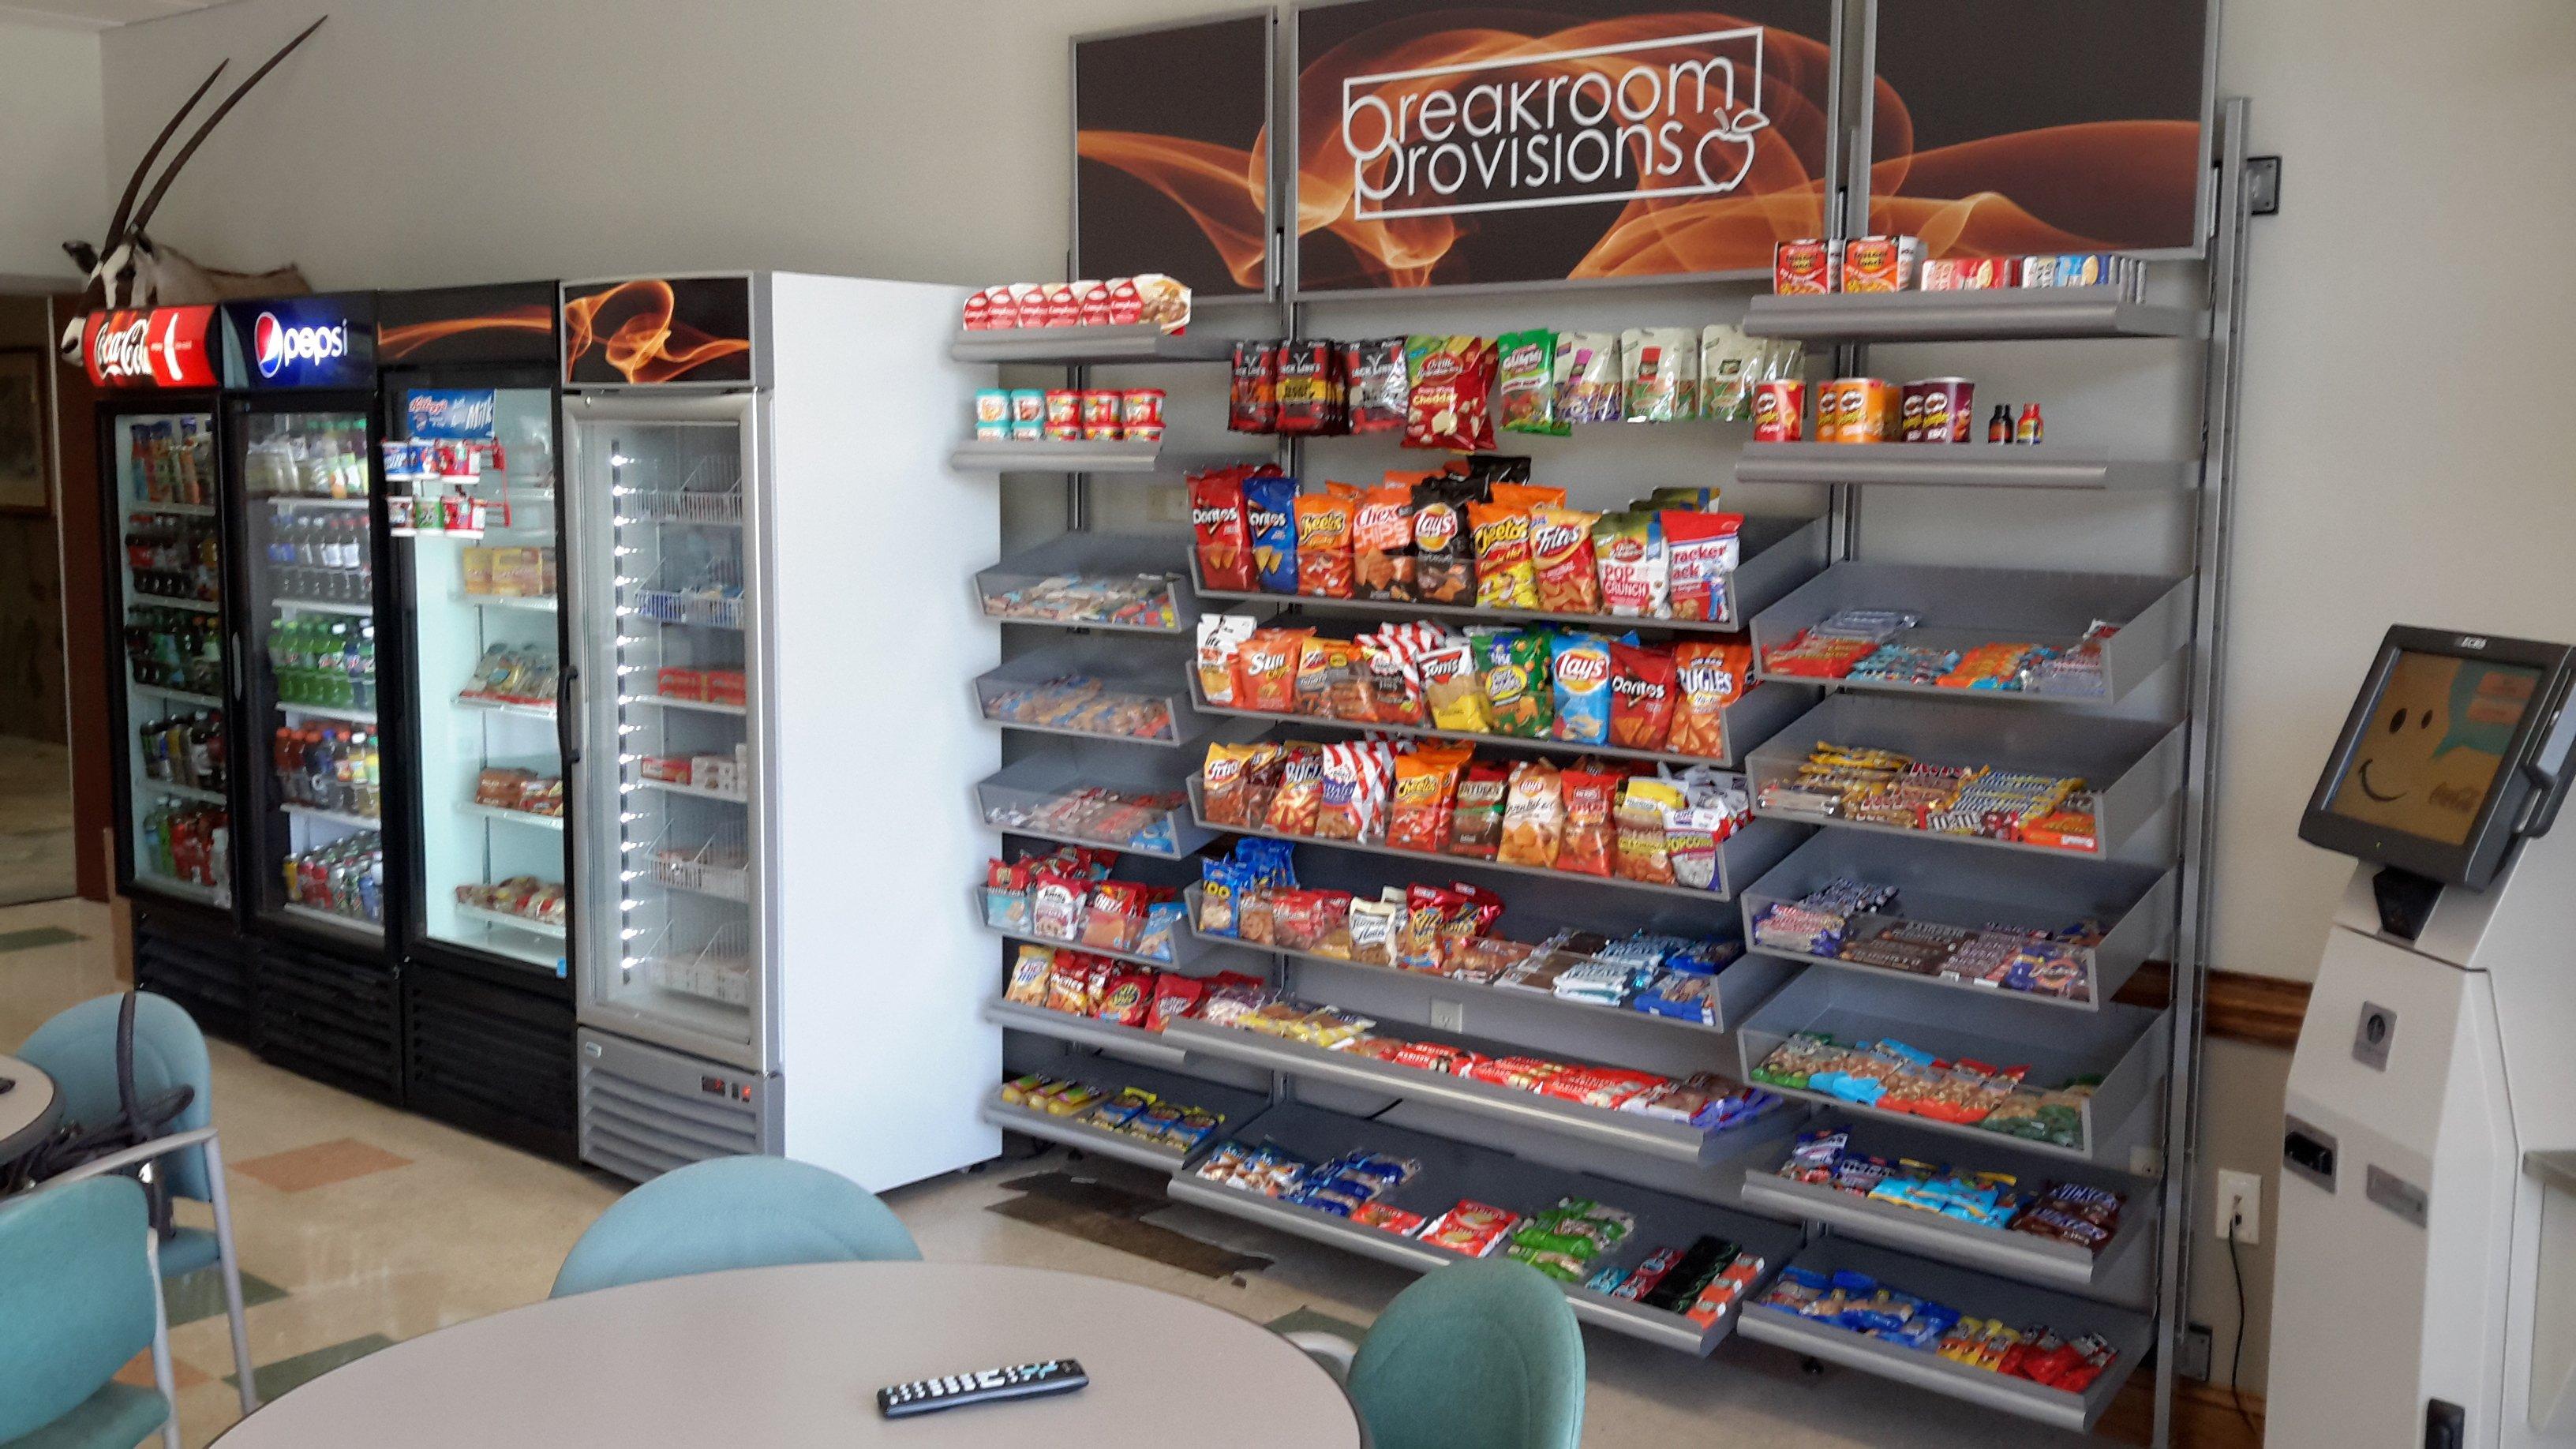 Break Room Provisions Winston - Salem, NC